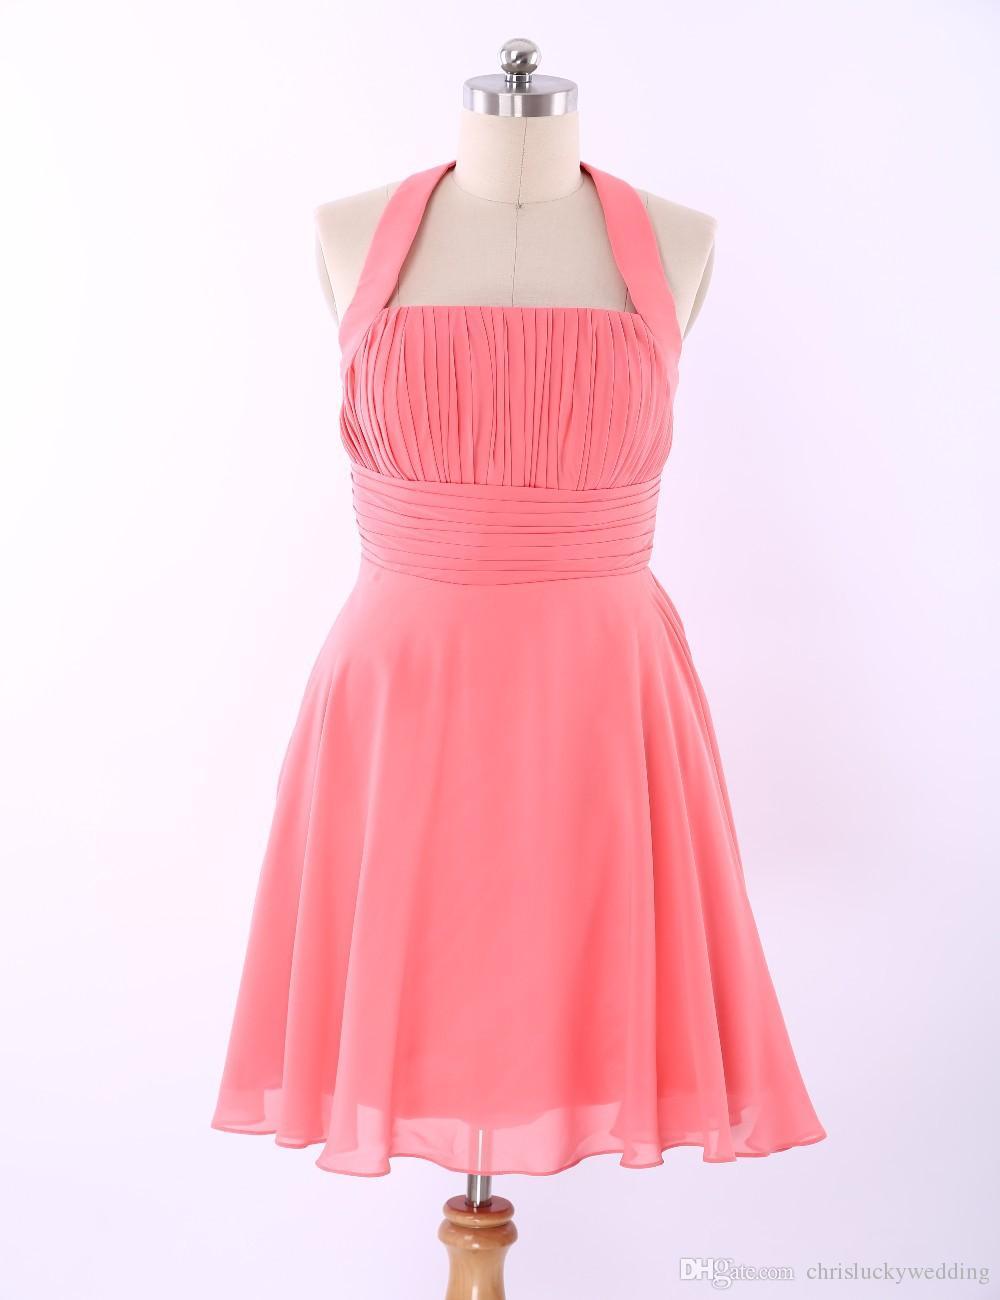 New Fashion 8th Grade Graduation Chiffon Short Custom Short Homecoming  Dresses Halter Off The Shoulder Prom Formal Party Gowns Dresses Red Long Dress  Semi ... ad2b1d33d